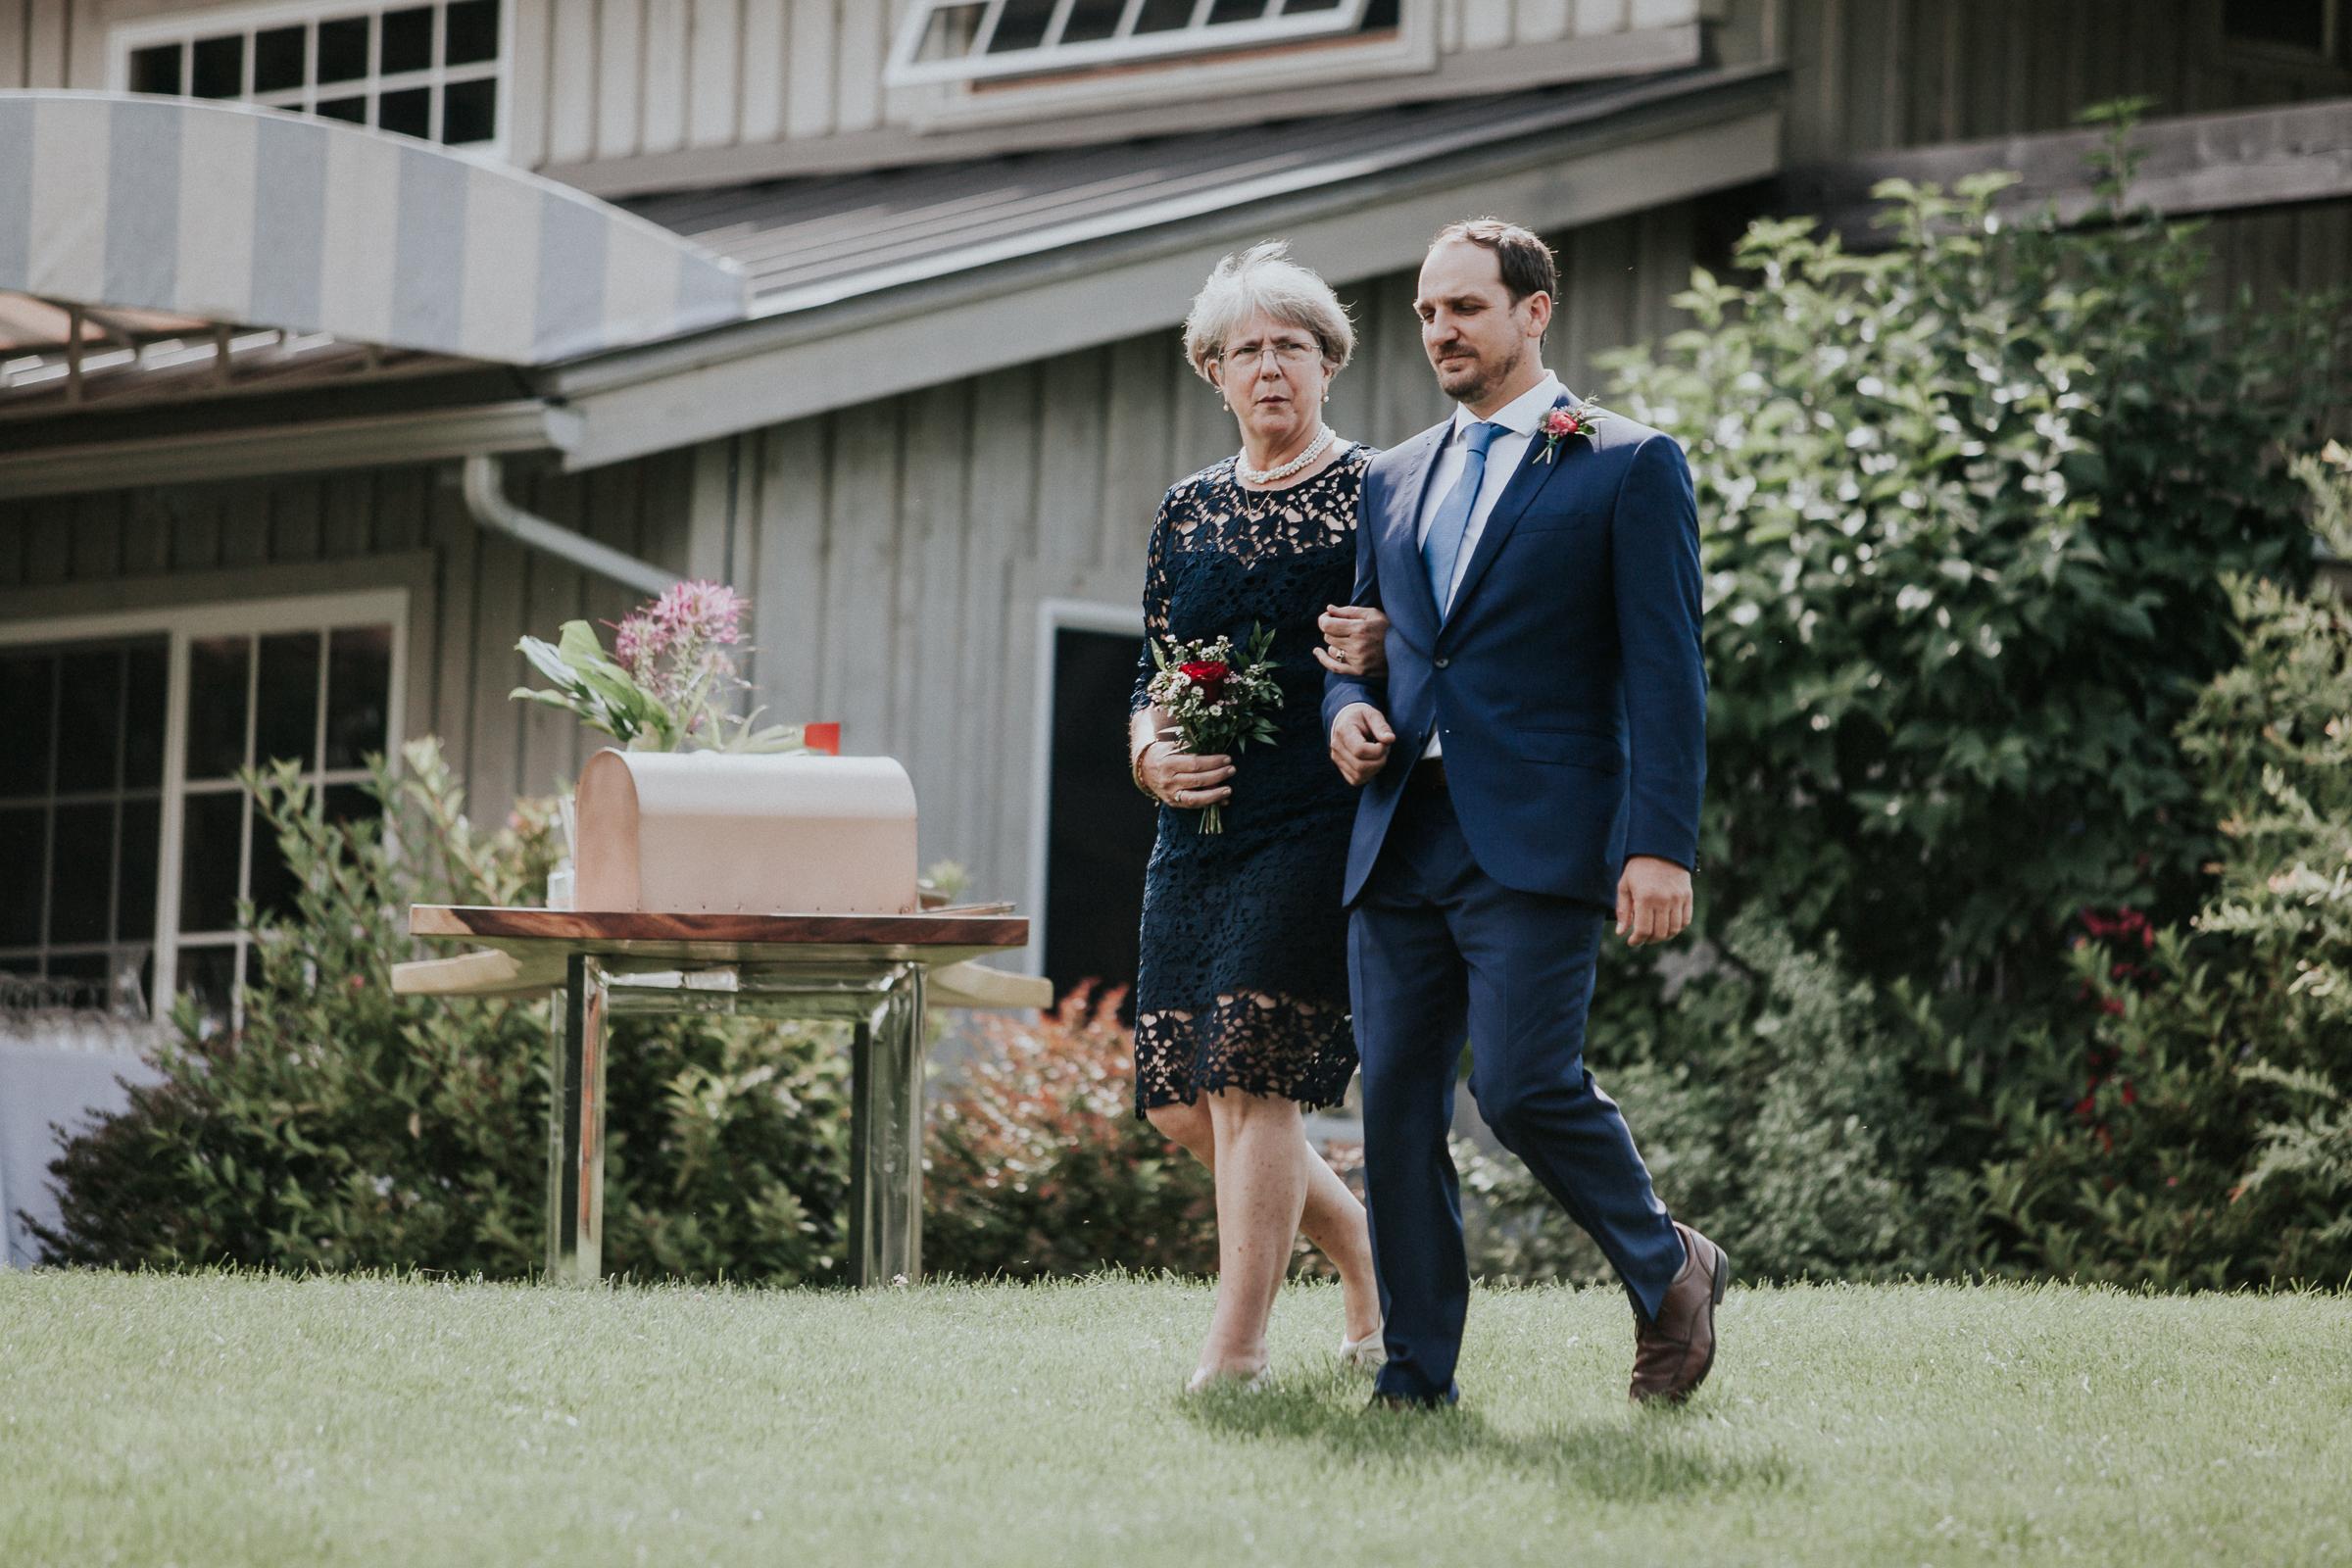 Marianmade-Farm-Wiscasset-Maine-Fine-Art-Documentary-Wedding-Photographer-Elvira-Kalviste-Photography-67.jpg